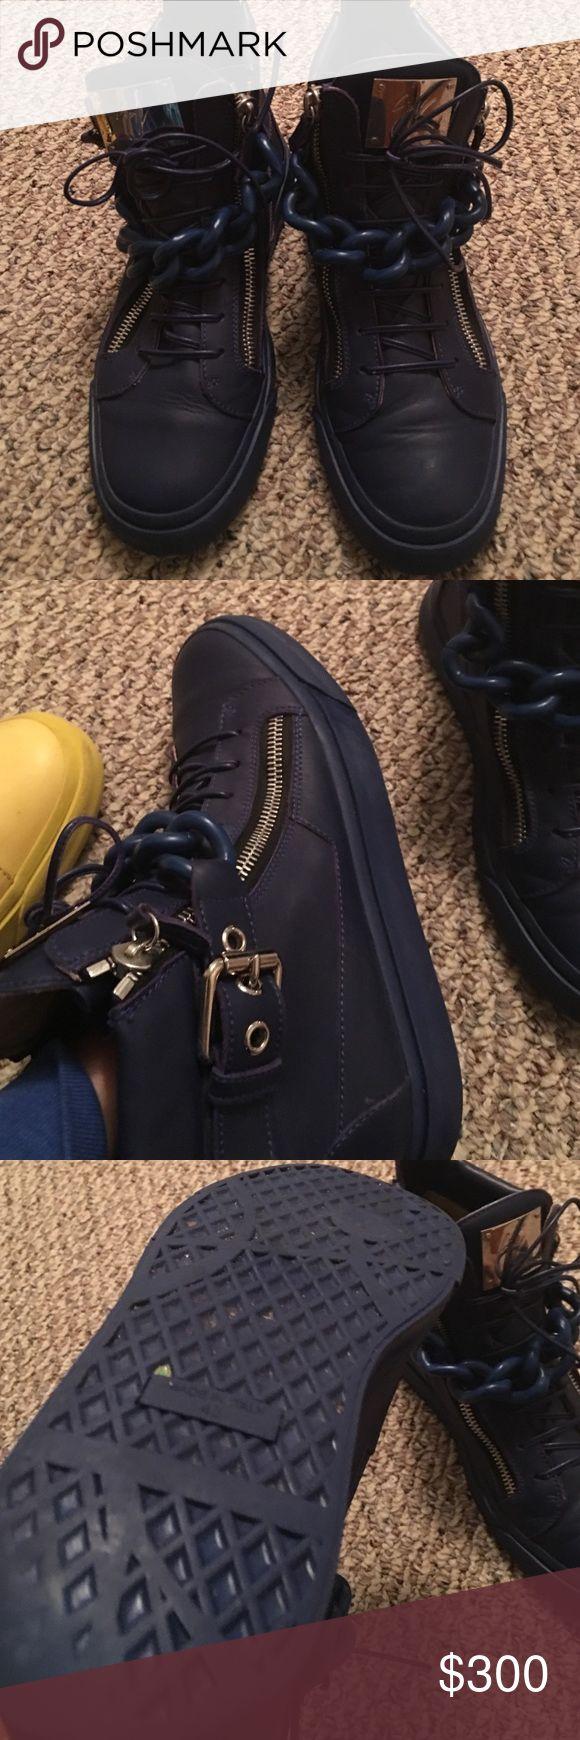 Men's Guiseppe Zanotti Sneakers Blue sz 43 Giuseppe Zanotti Shoes Sneakers